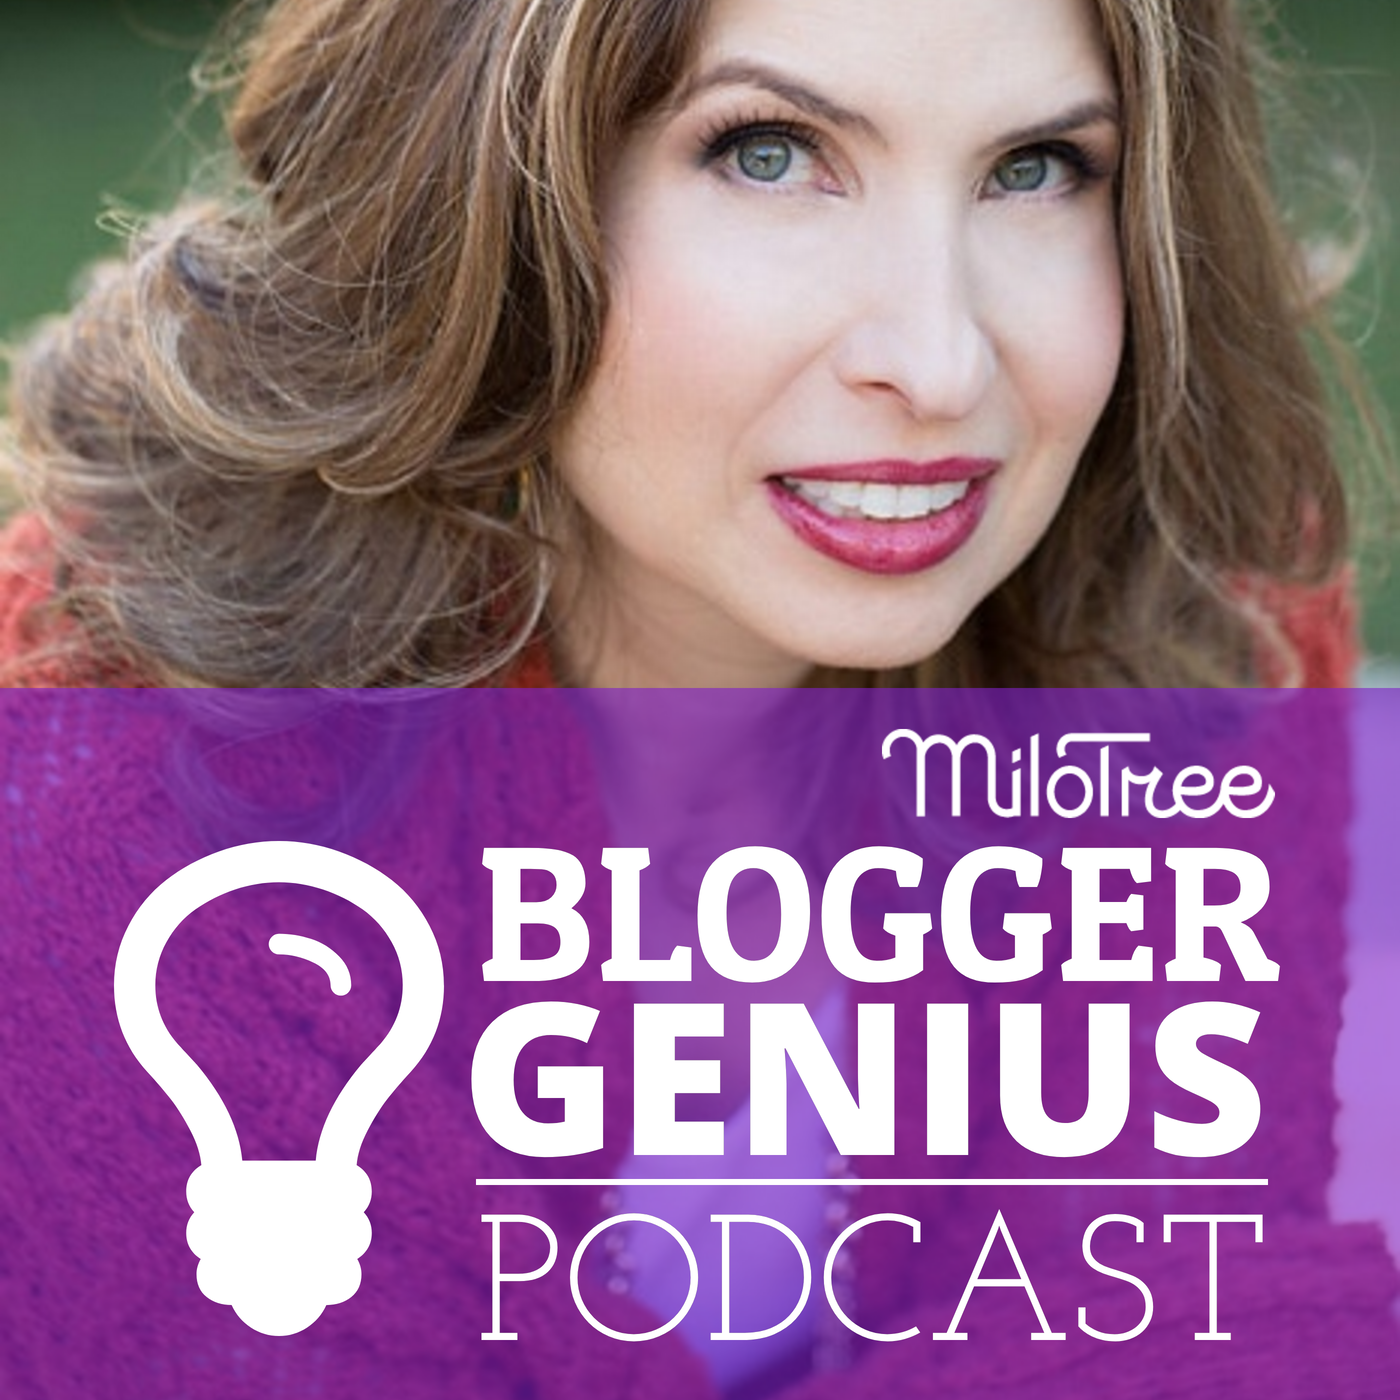 The Blogger Genius Podcast with Jillian Leslie show art